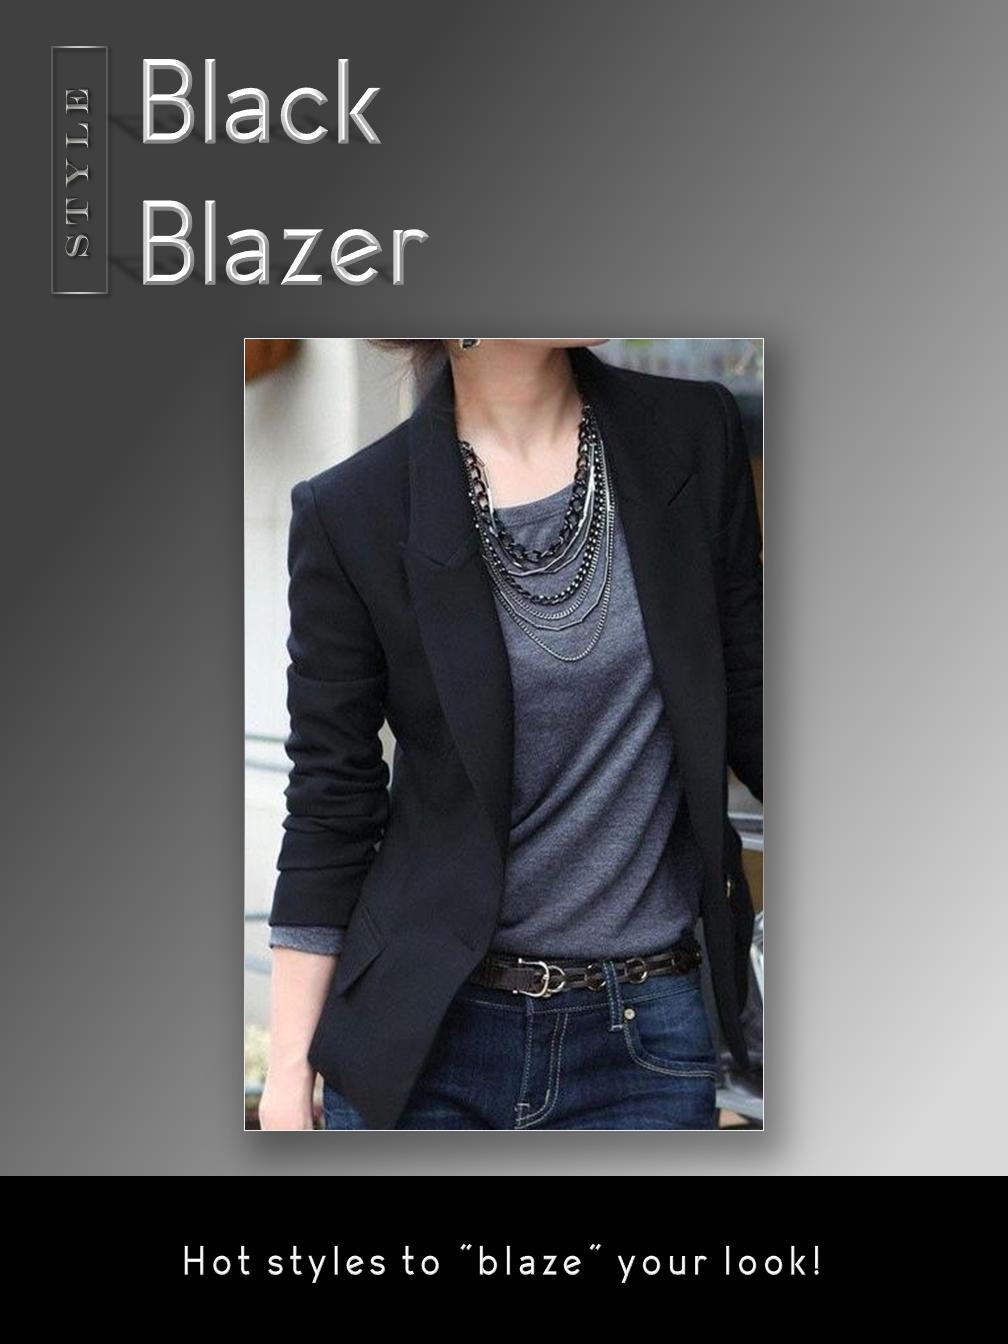 Black Blazers